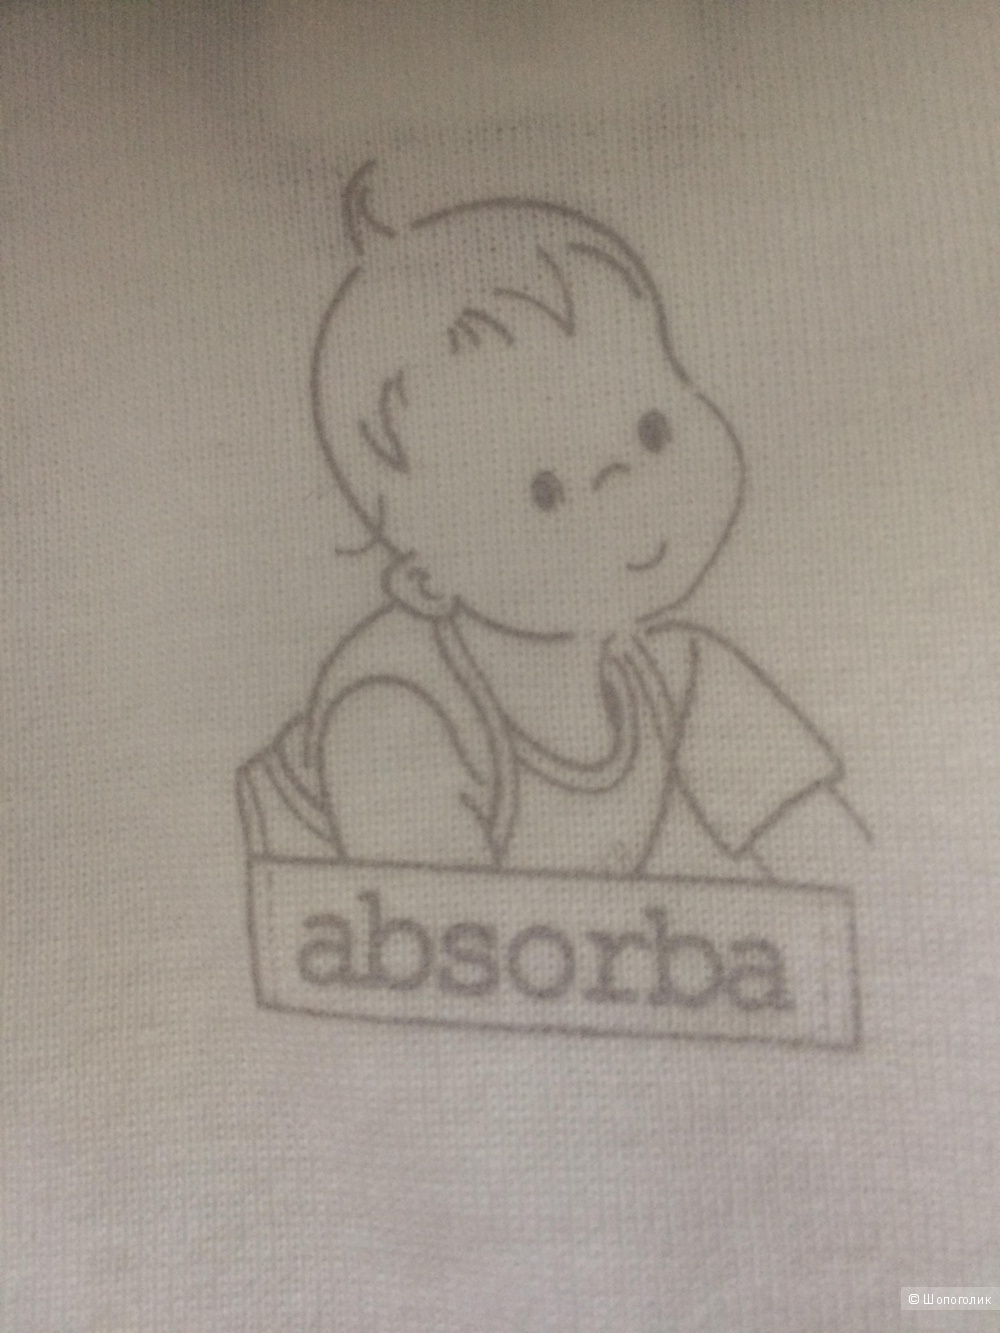 Футболки и лонги Absorba, 3-4 года